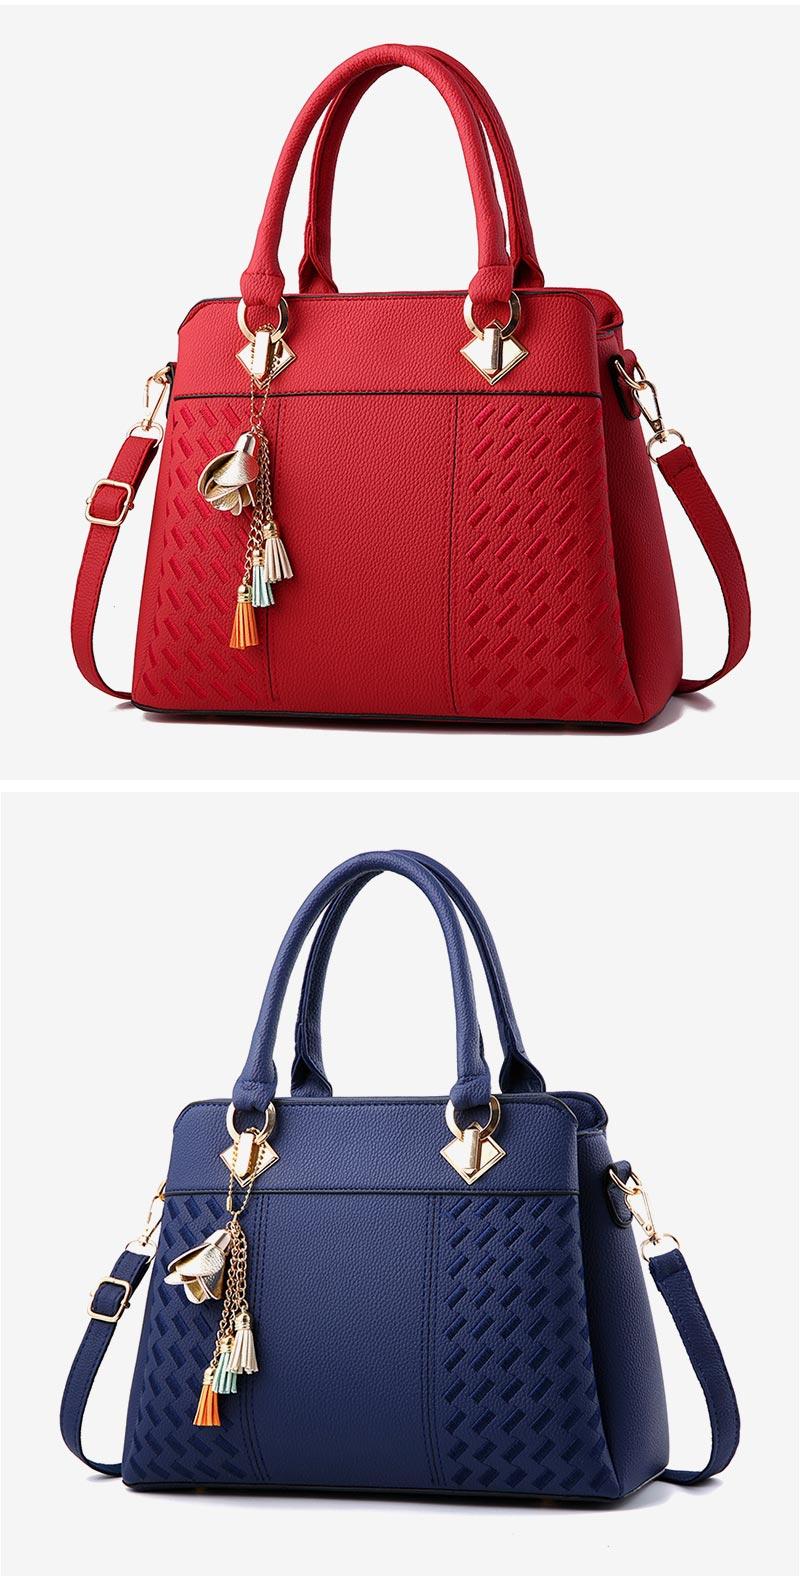 STSR Leather Clutch Bag Female Handbag Luxury Beach Tote Ms. Fringe Shoulder Bag Tote gray one size 19